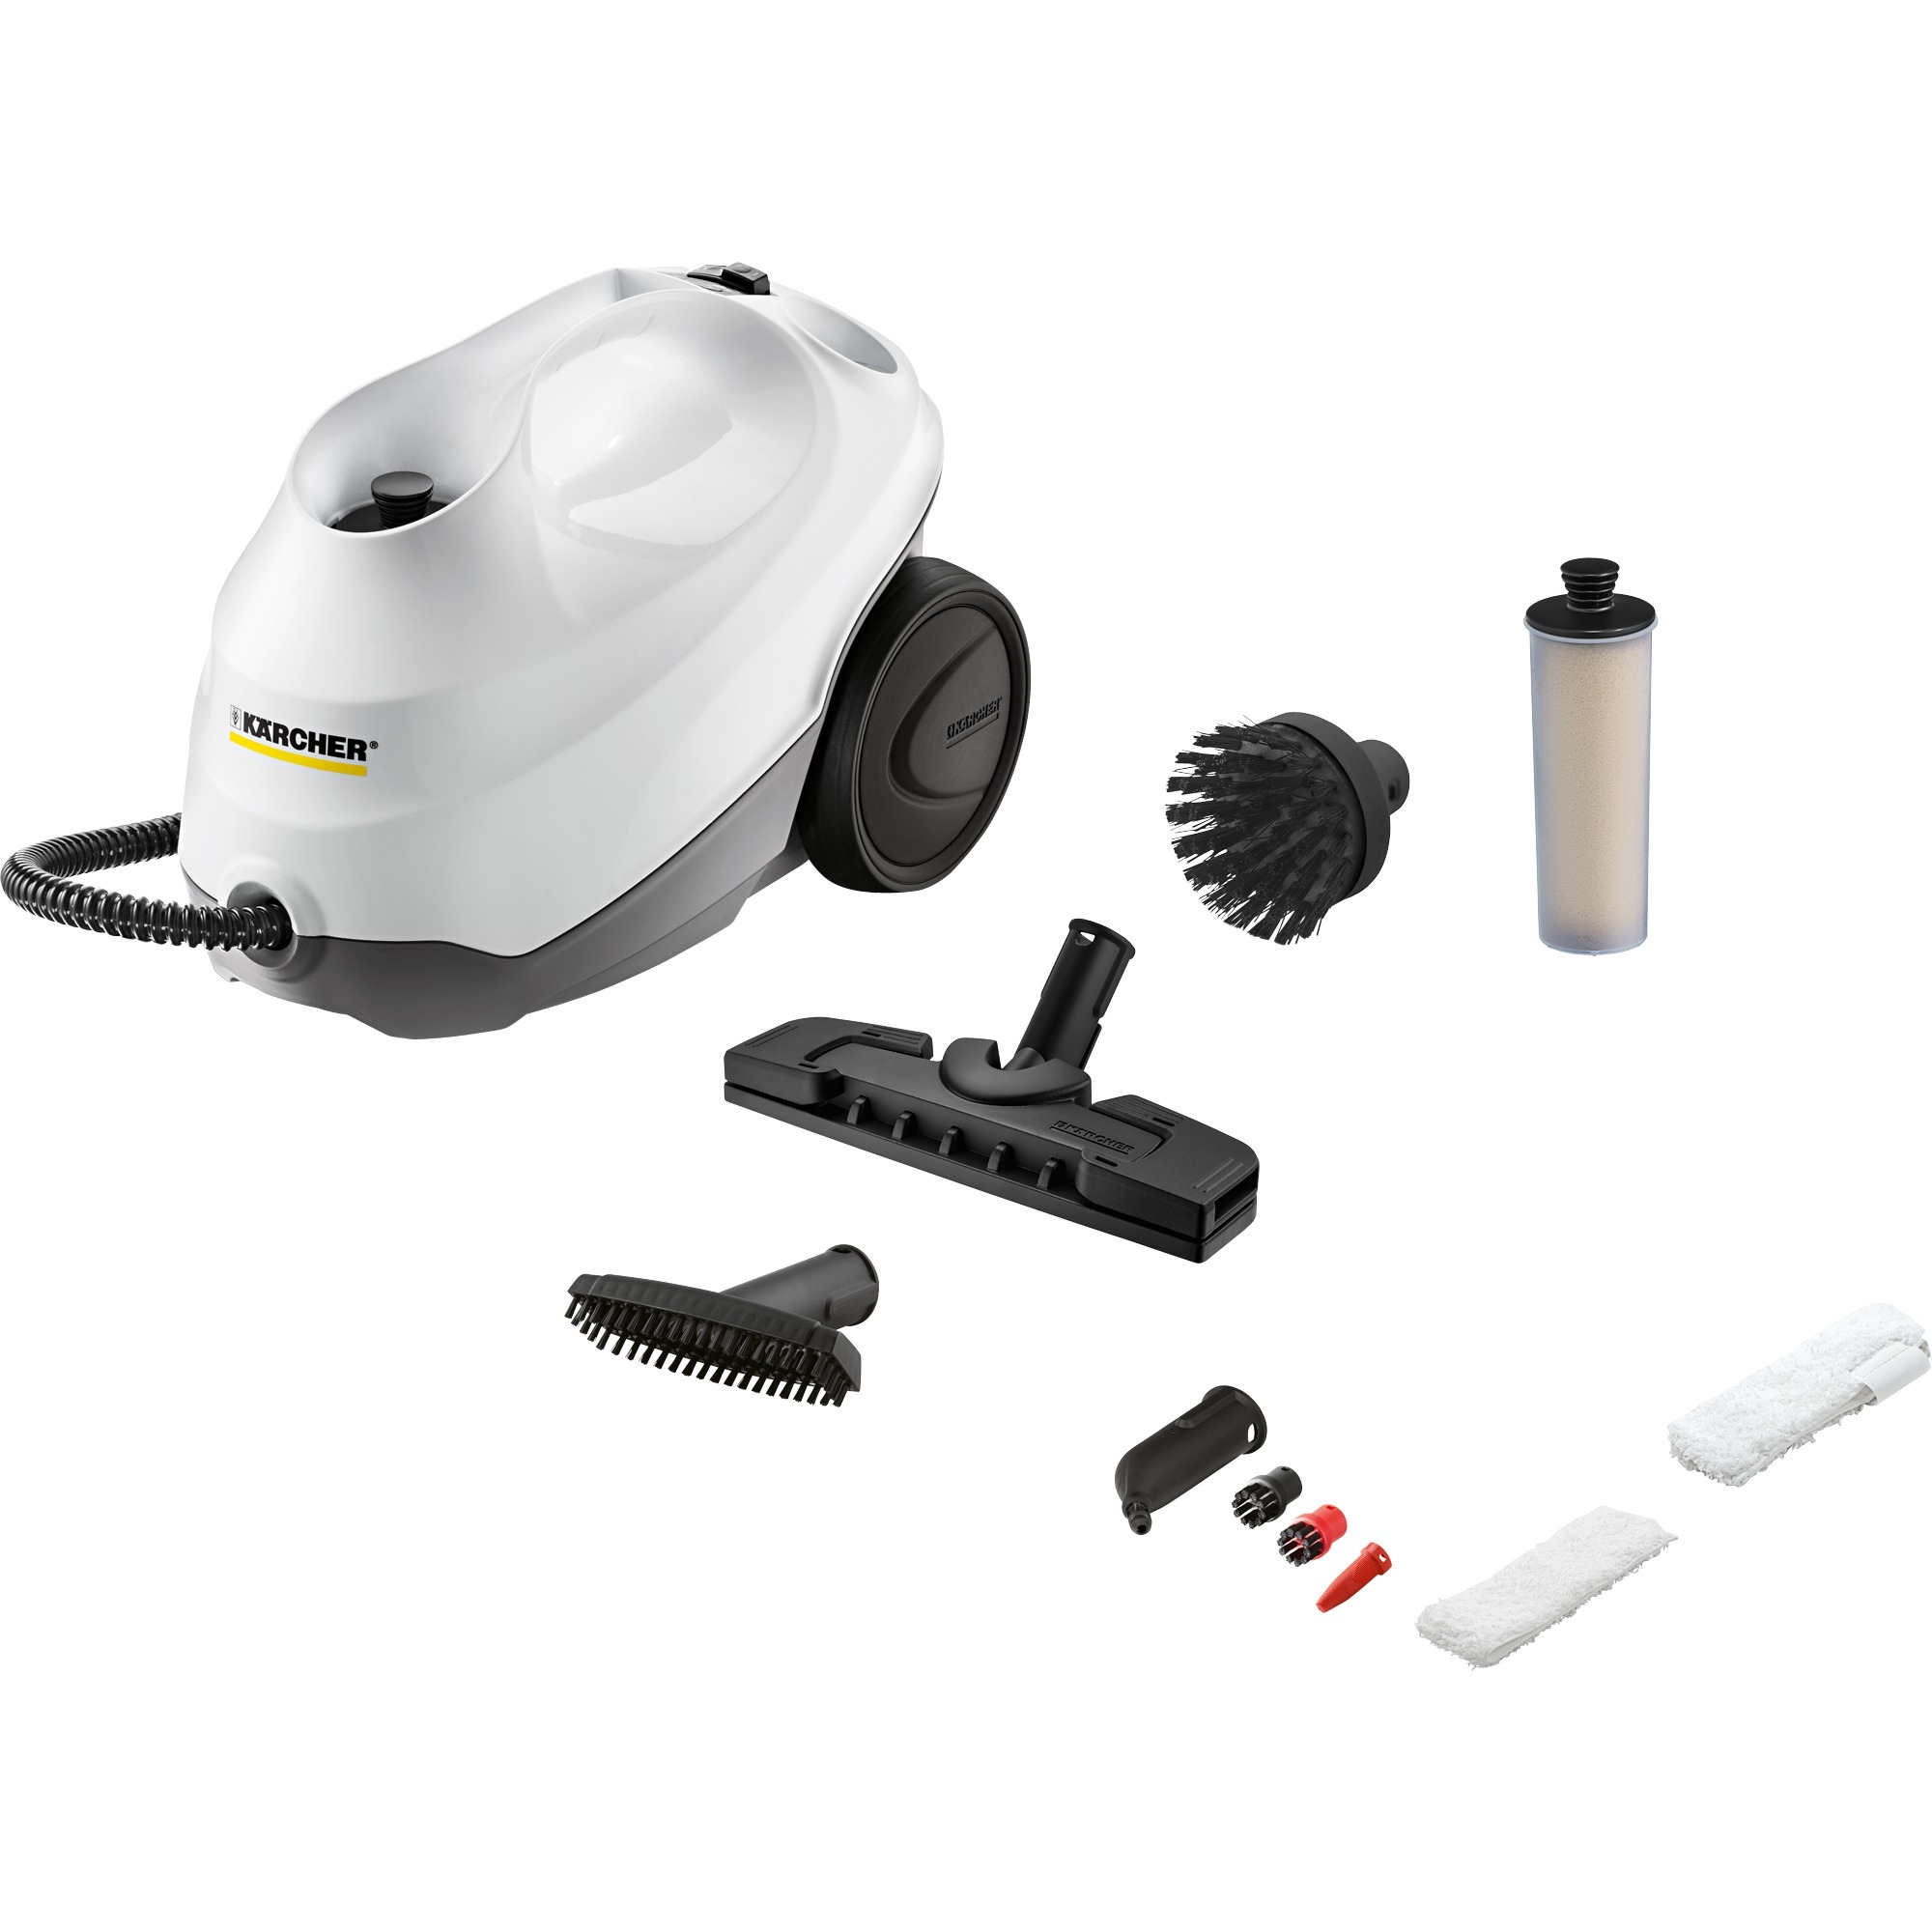 SC 3 Premium Limpiador a vapor de cilindro 1 L Negro, Blanco 1900 W, Limpiador de vapor